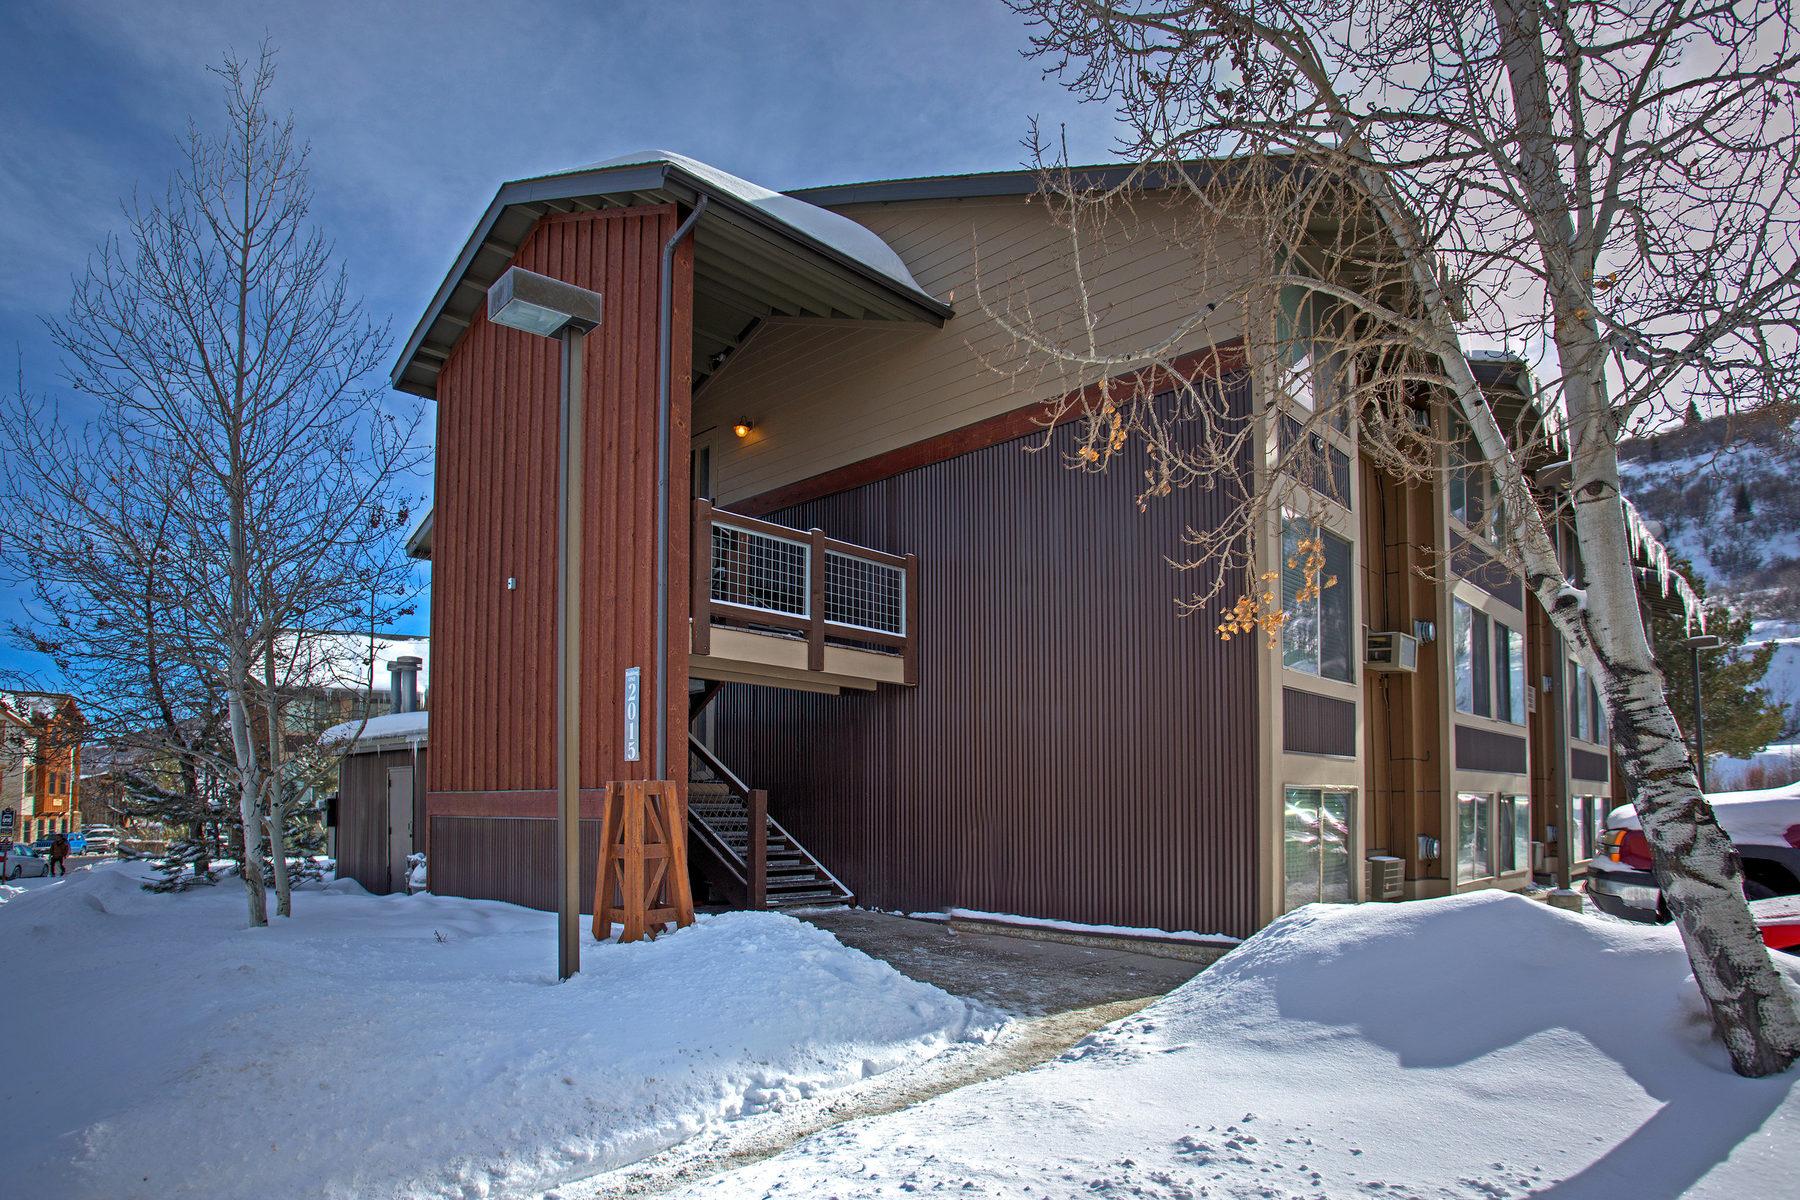 Condominium for Sale at Ideal Investment Property 2015 Prospector Sq #122 Park City, Utah 84060 United States